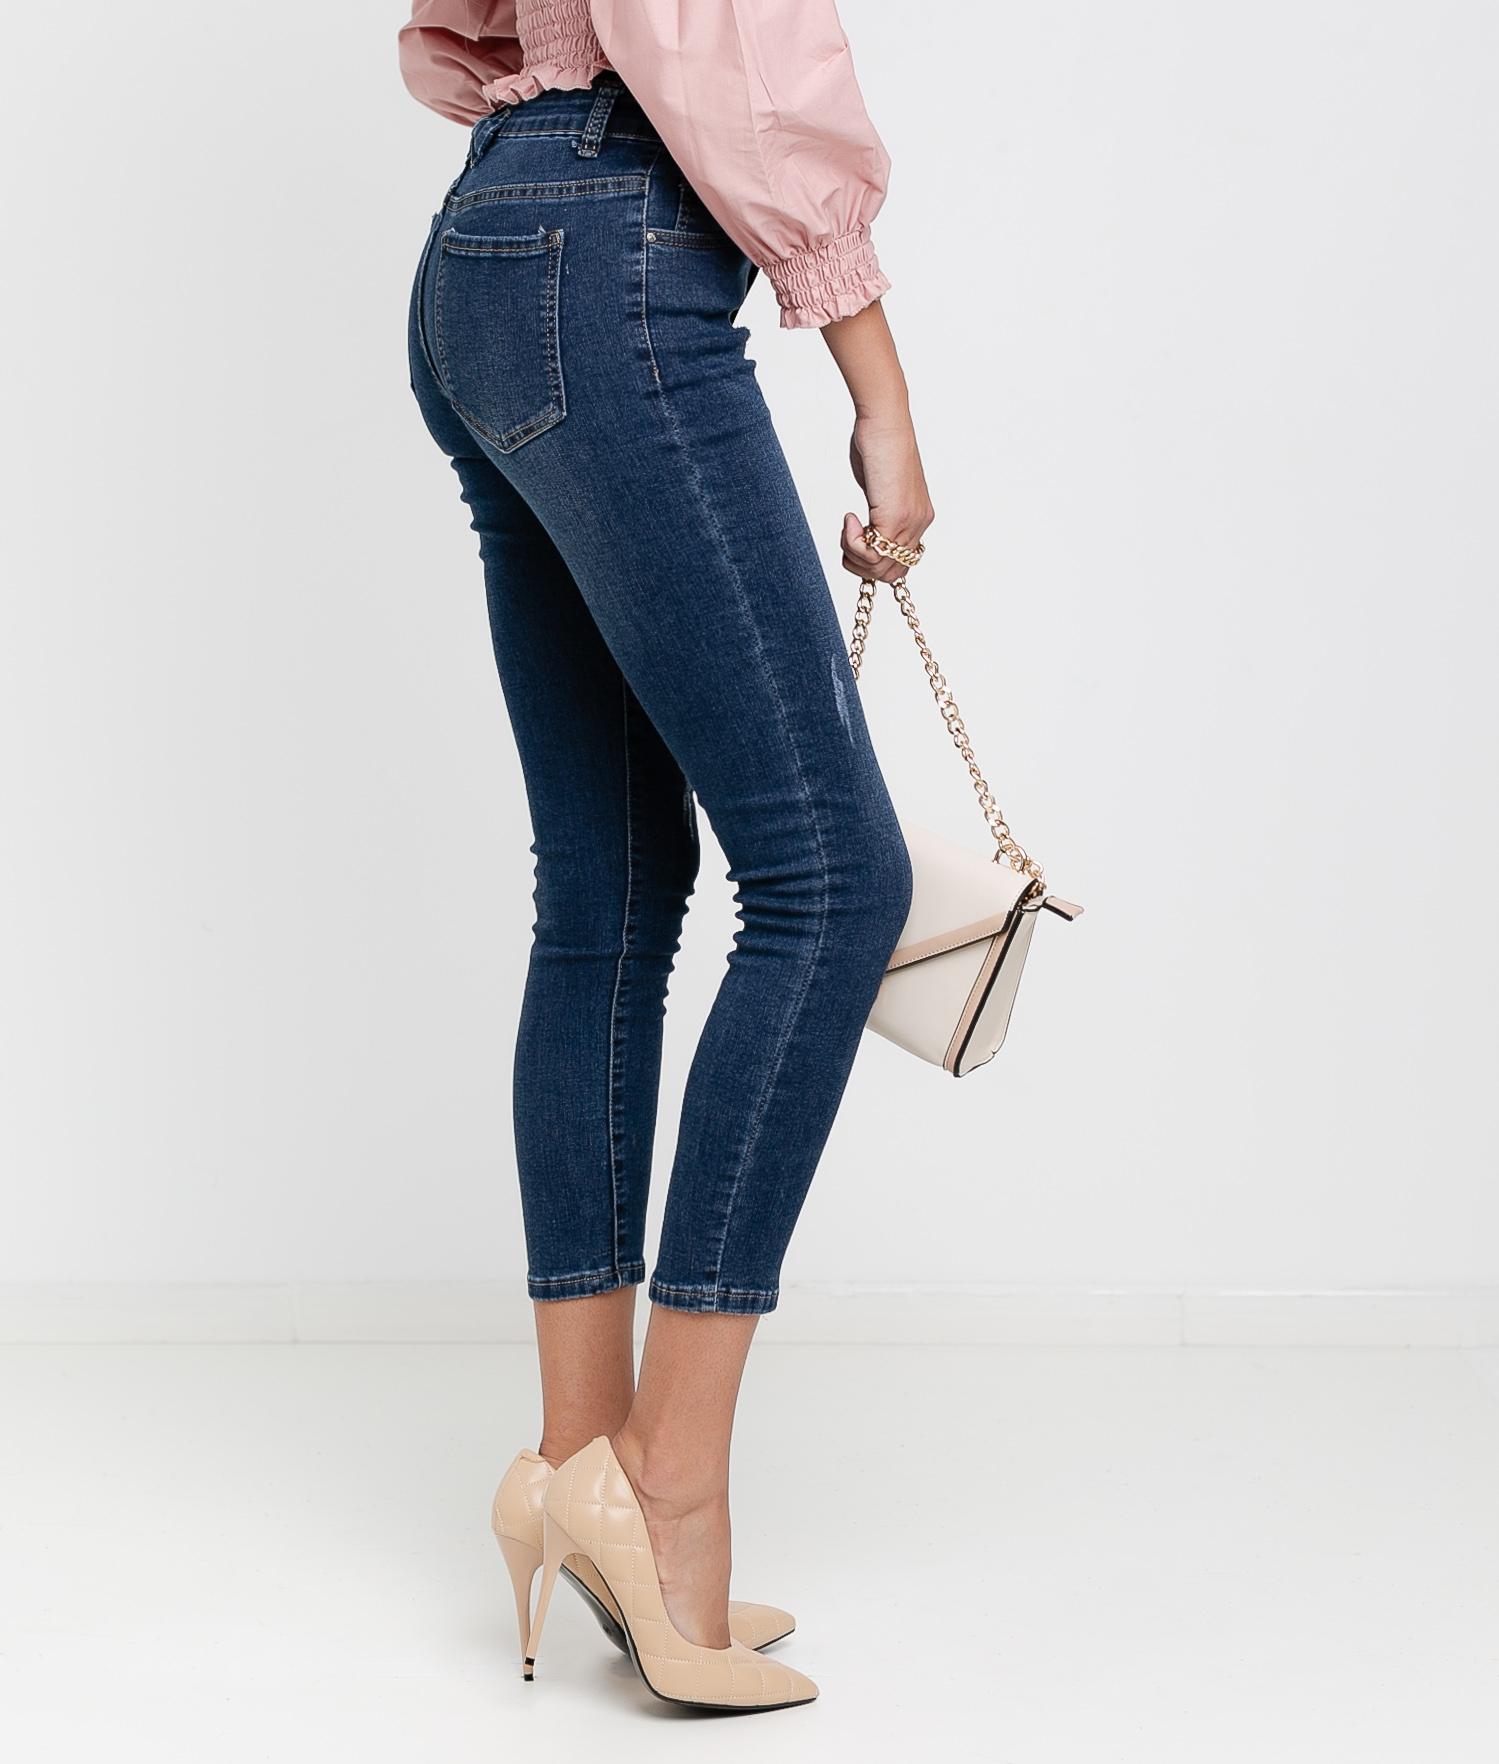 Pantaloni Leor - Denim Scuro